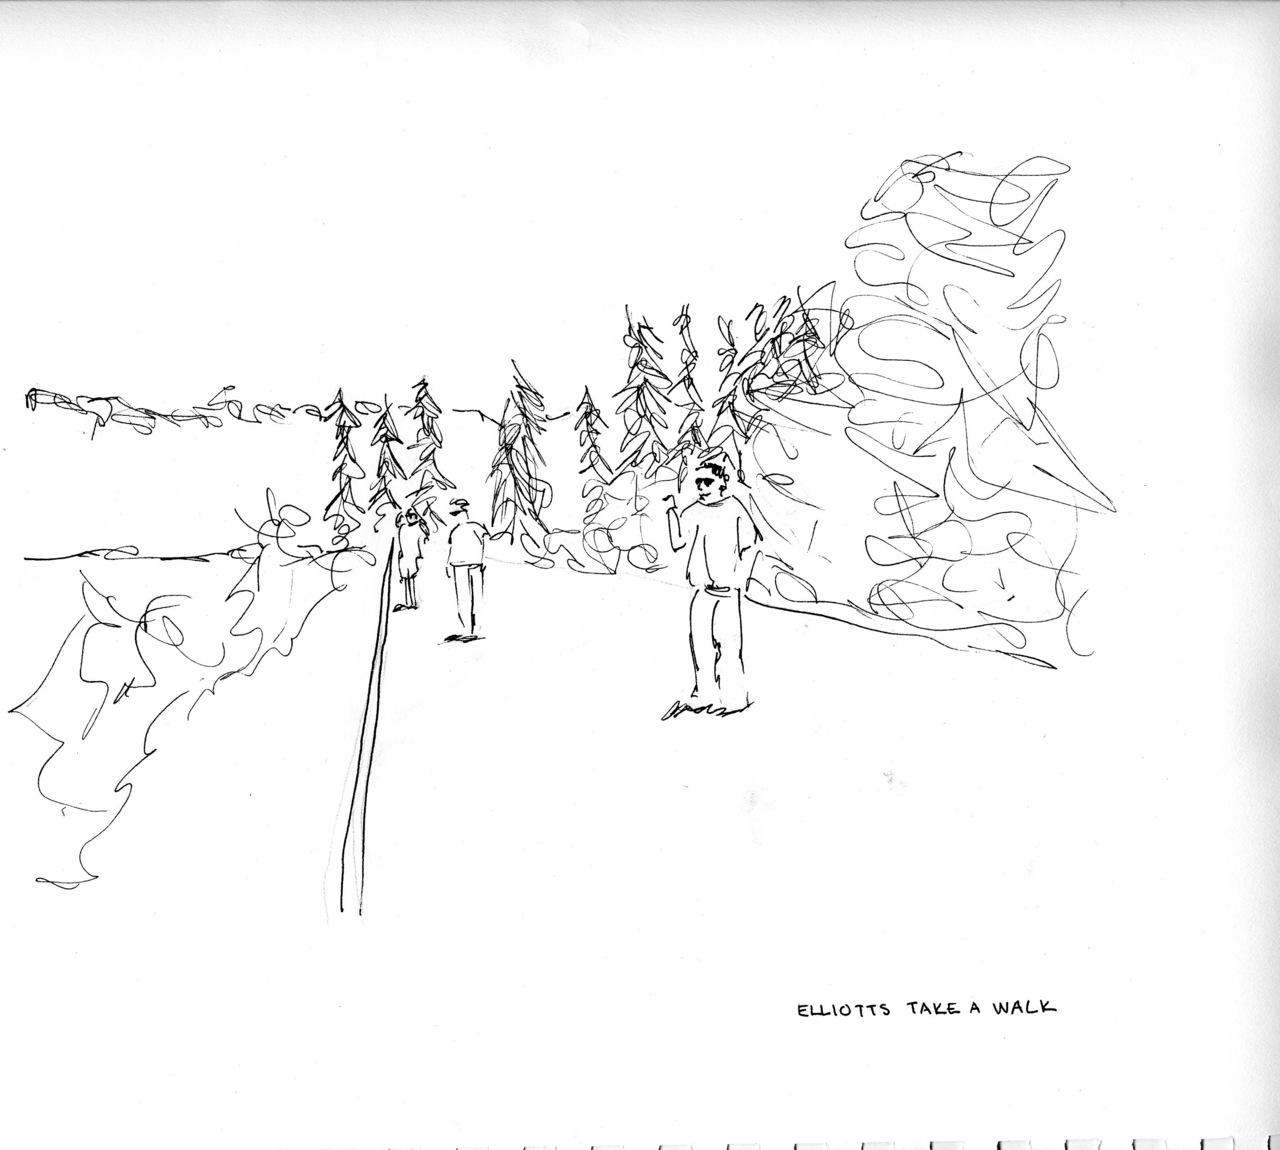 the elliotts take a walk    (britt original)